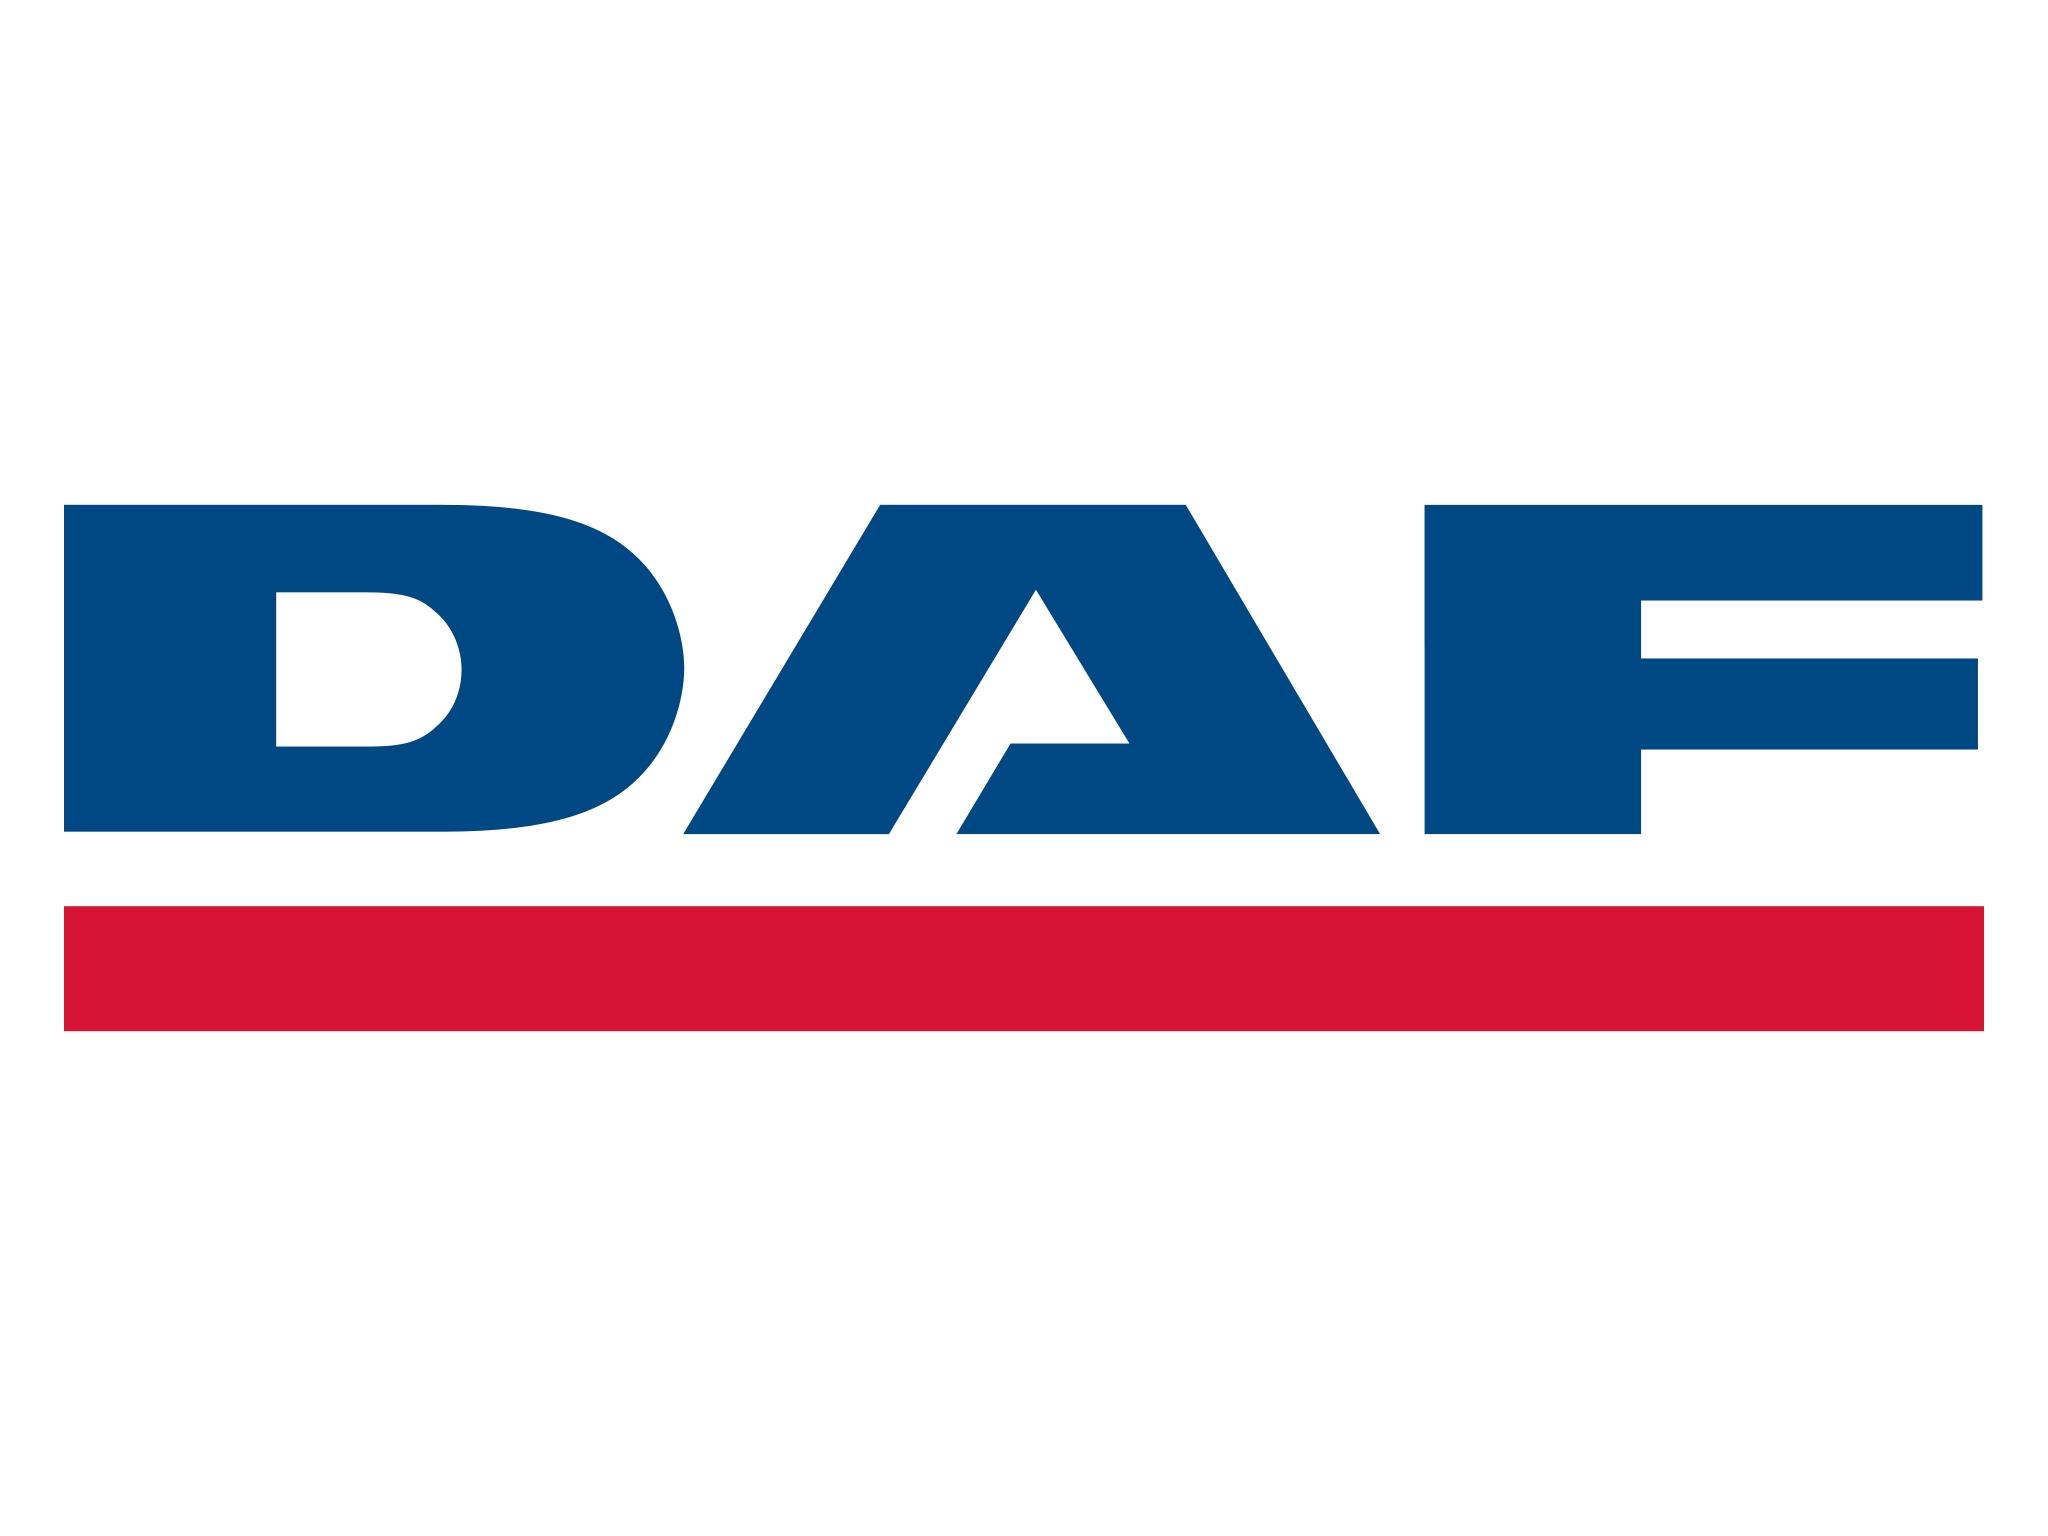 логотипы грузовиков: